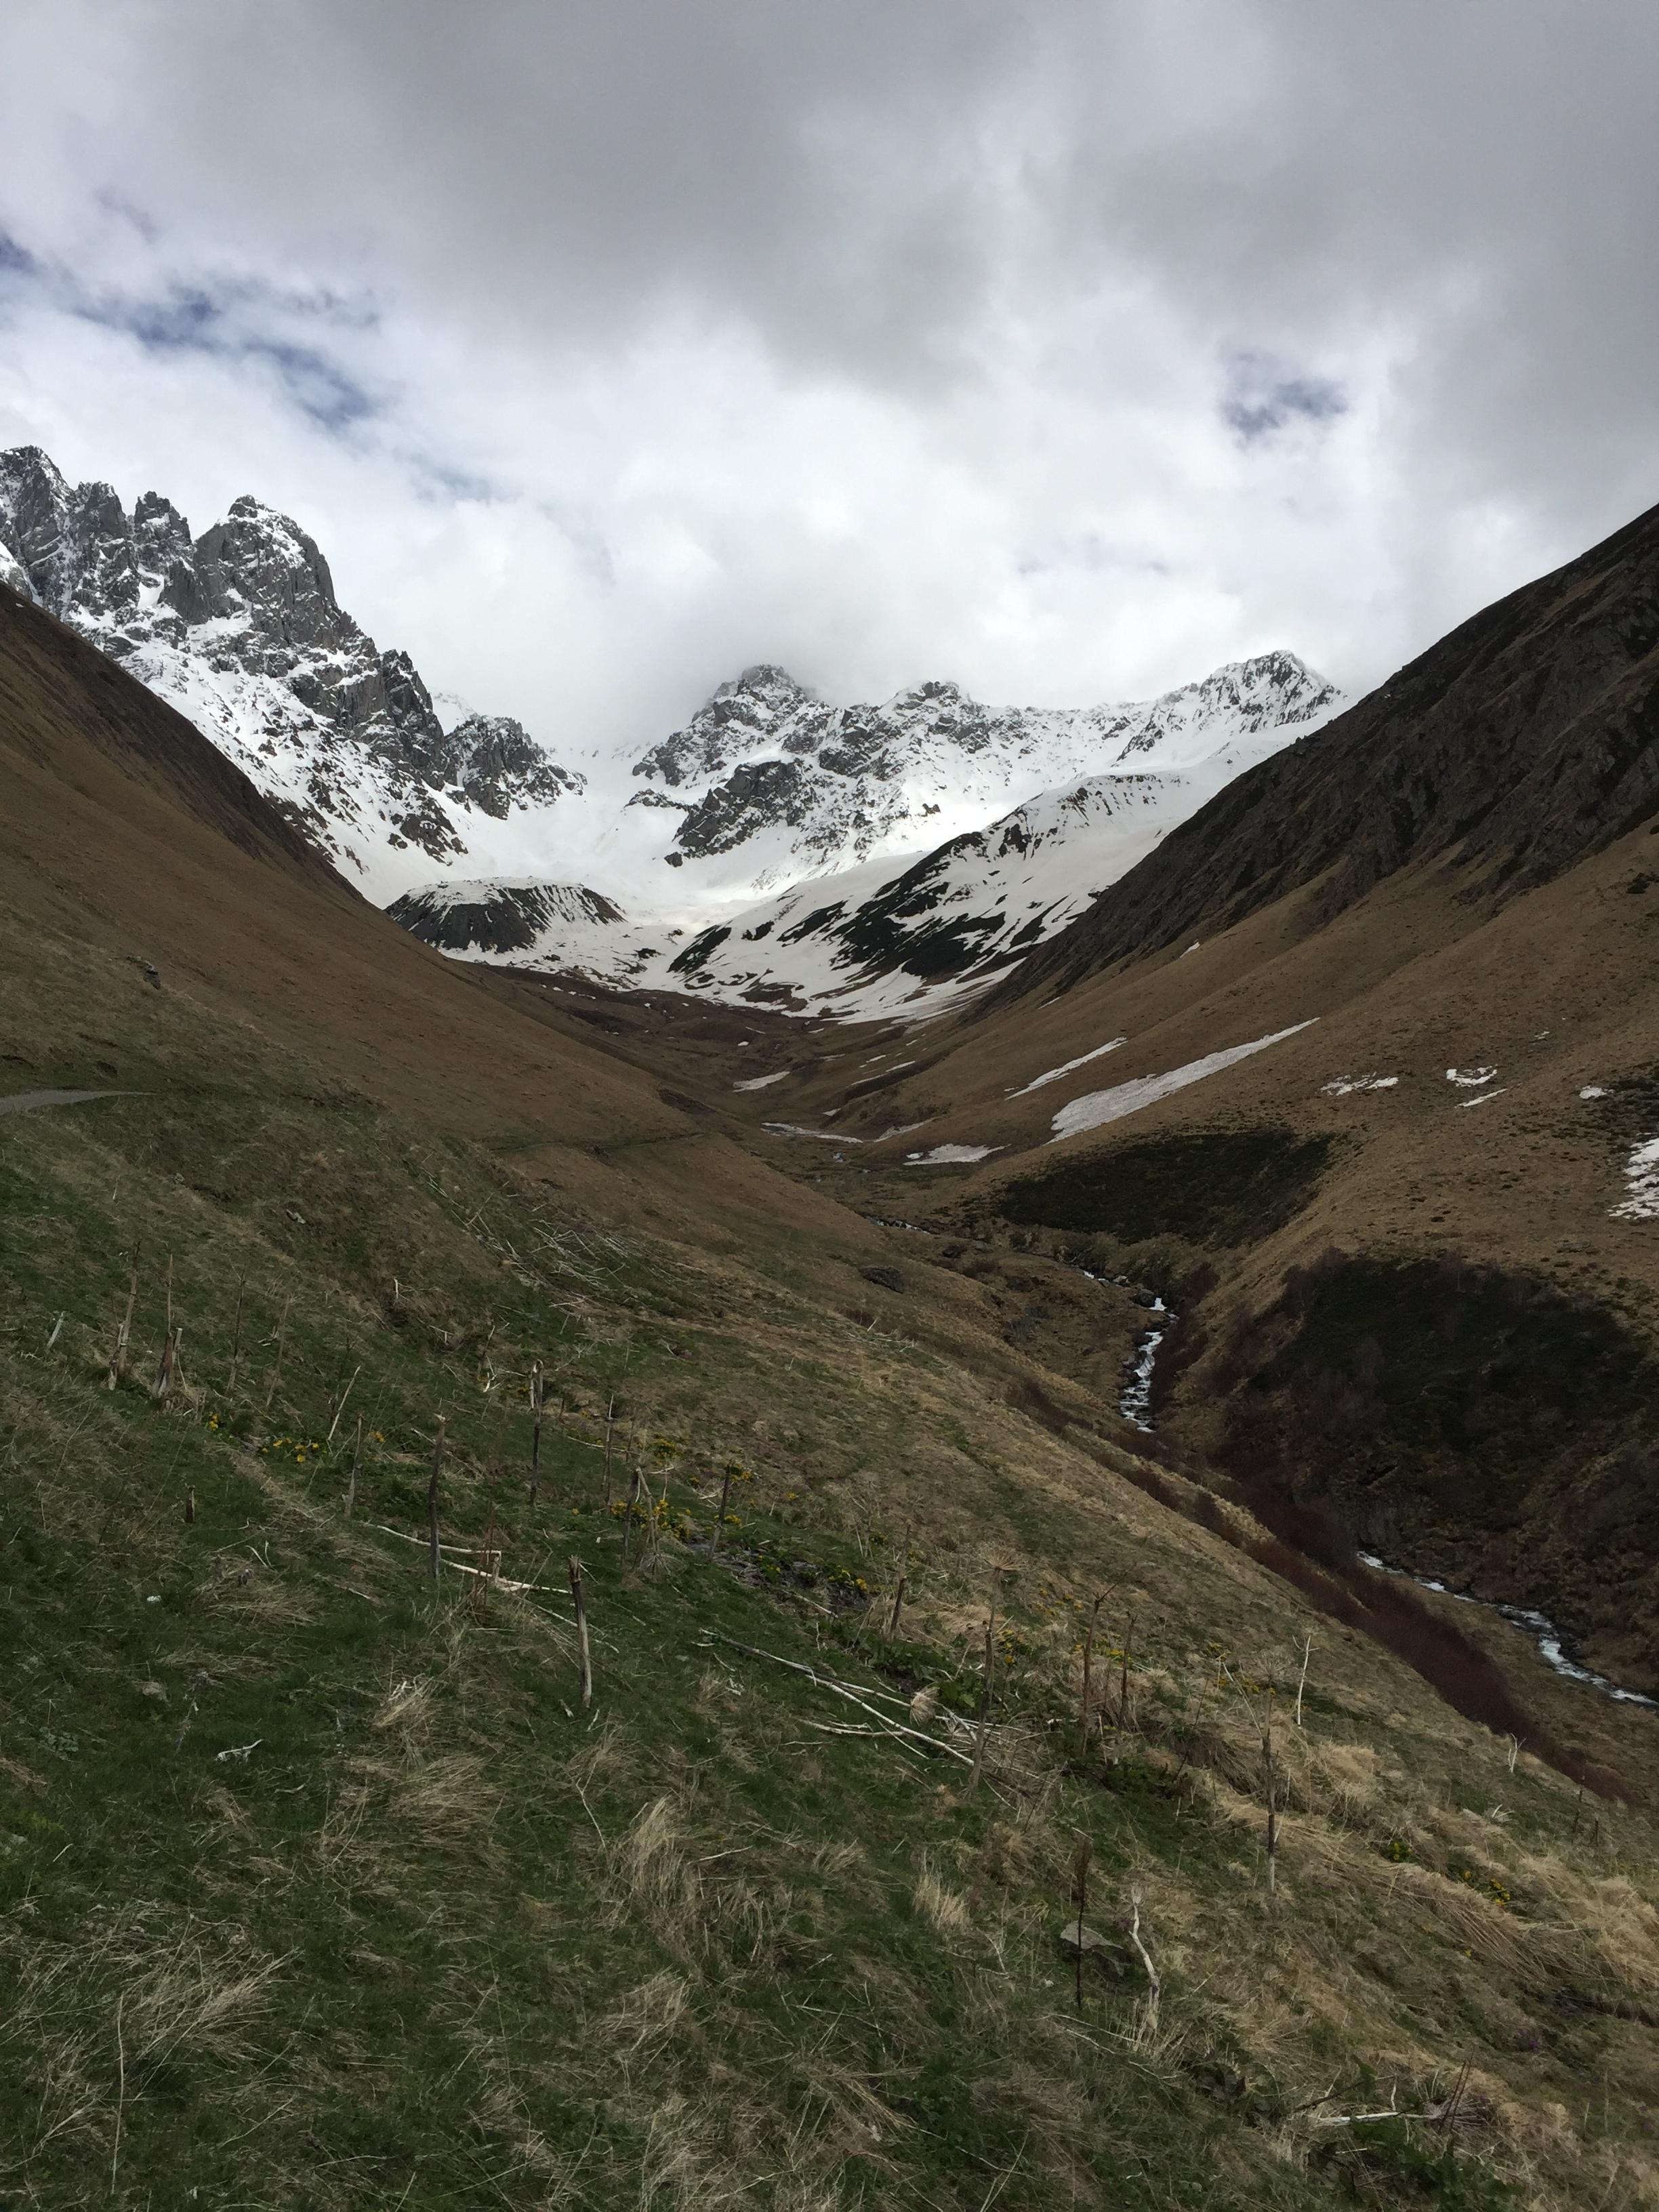 Our walk to the glacier